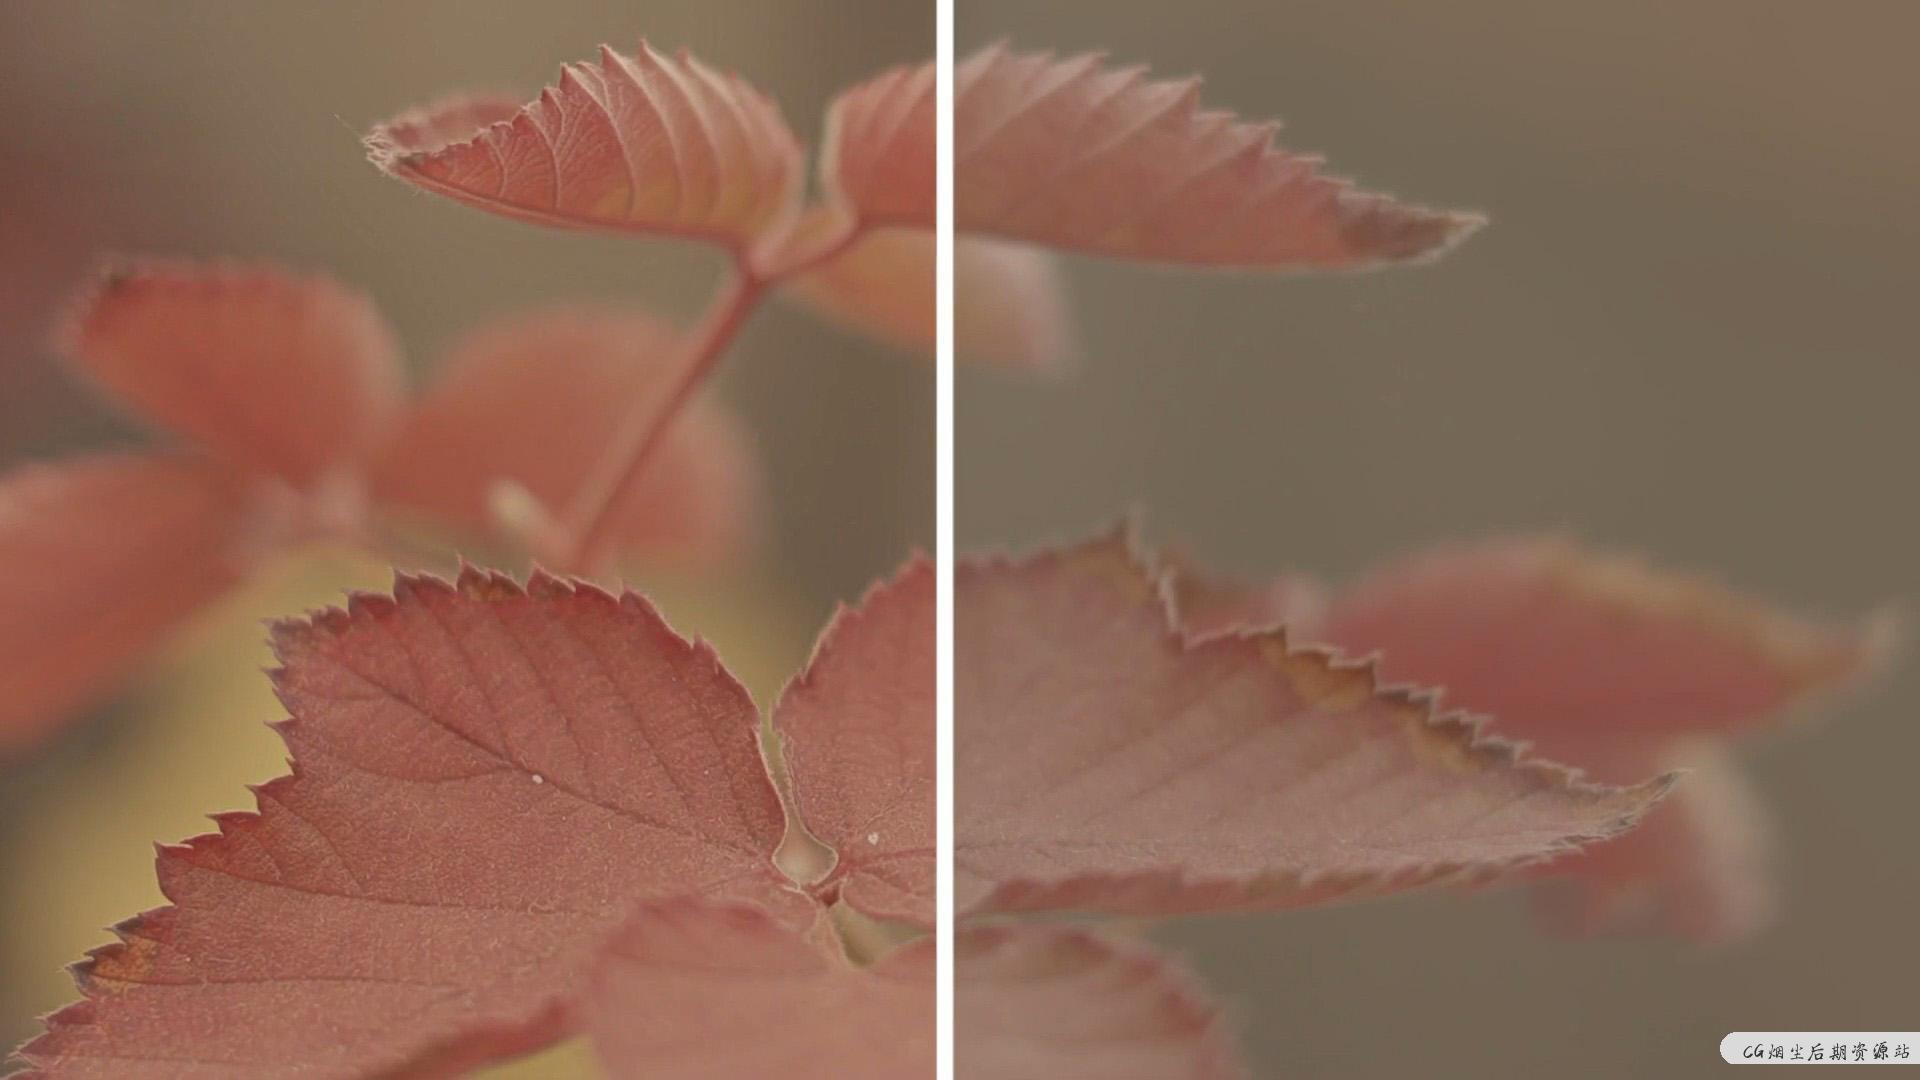 fcpx插件 视频图像锐化工具画面清晰度增强插件 Image Sharpener